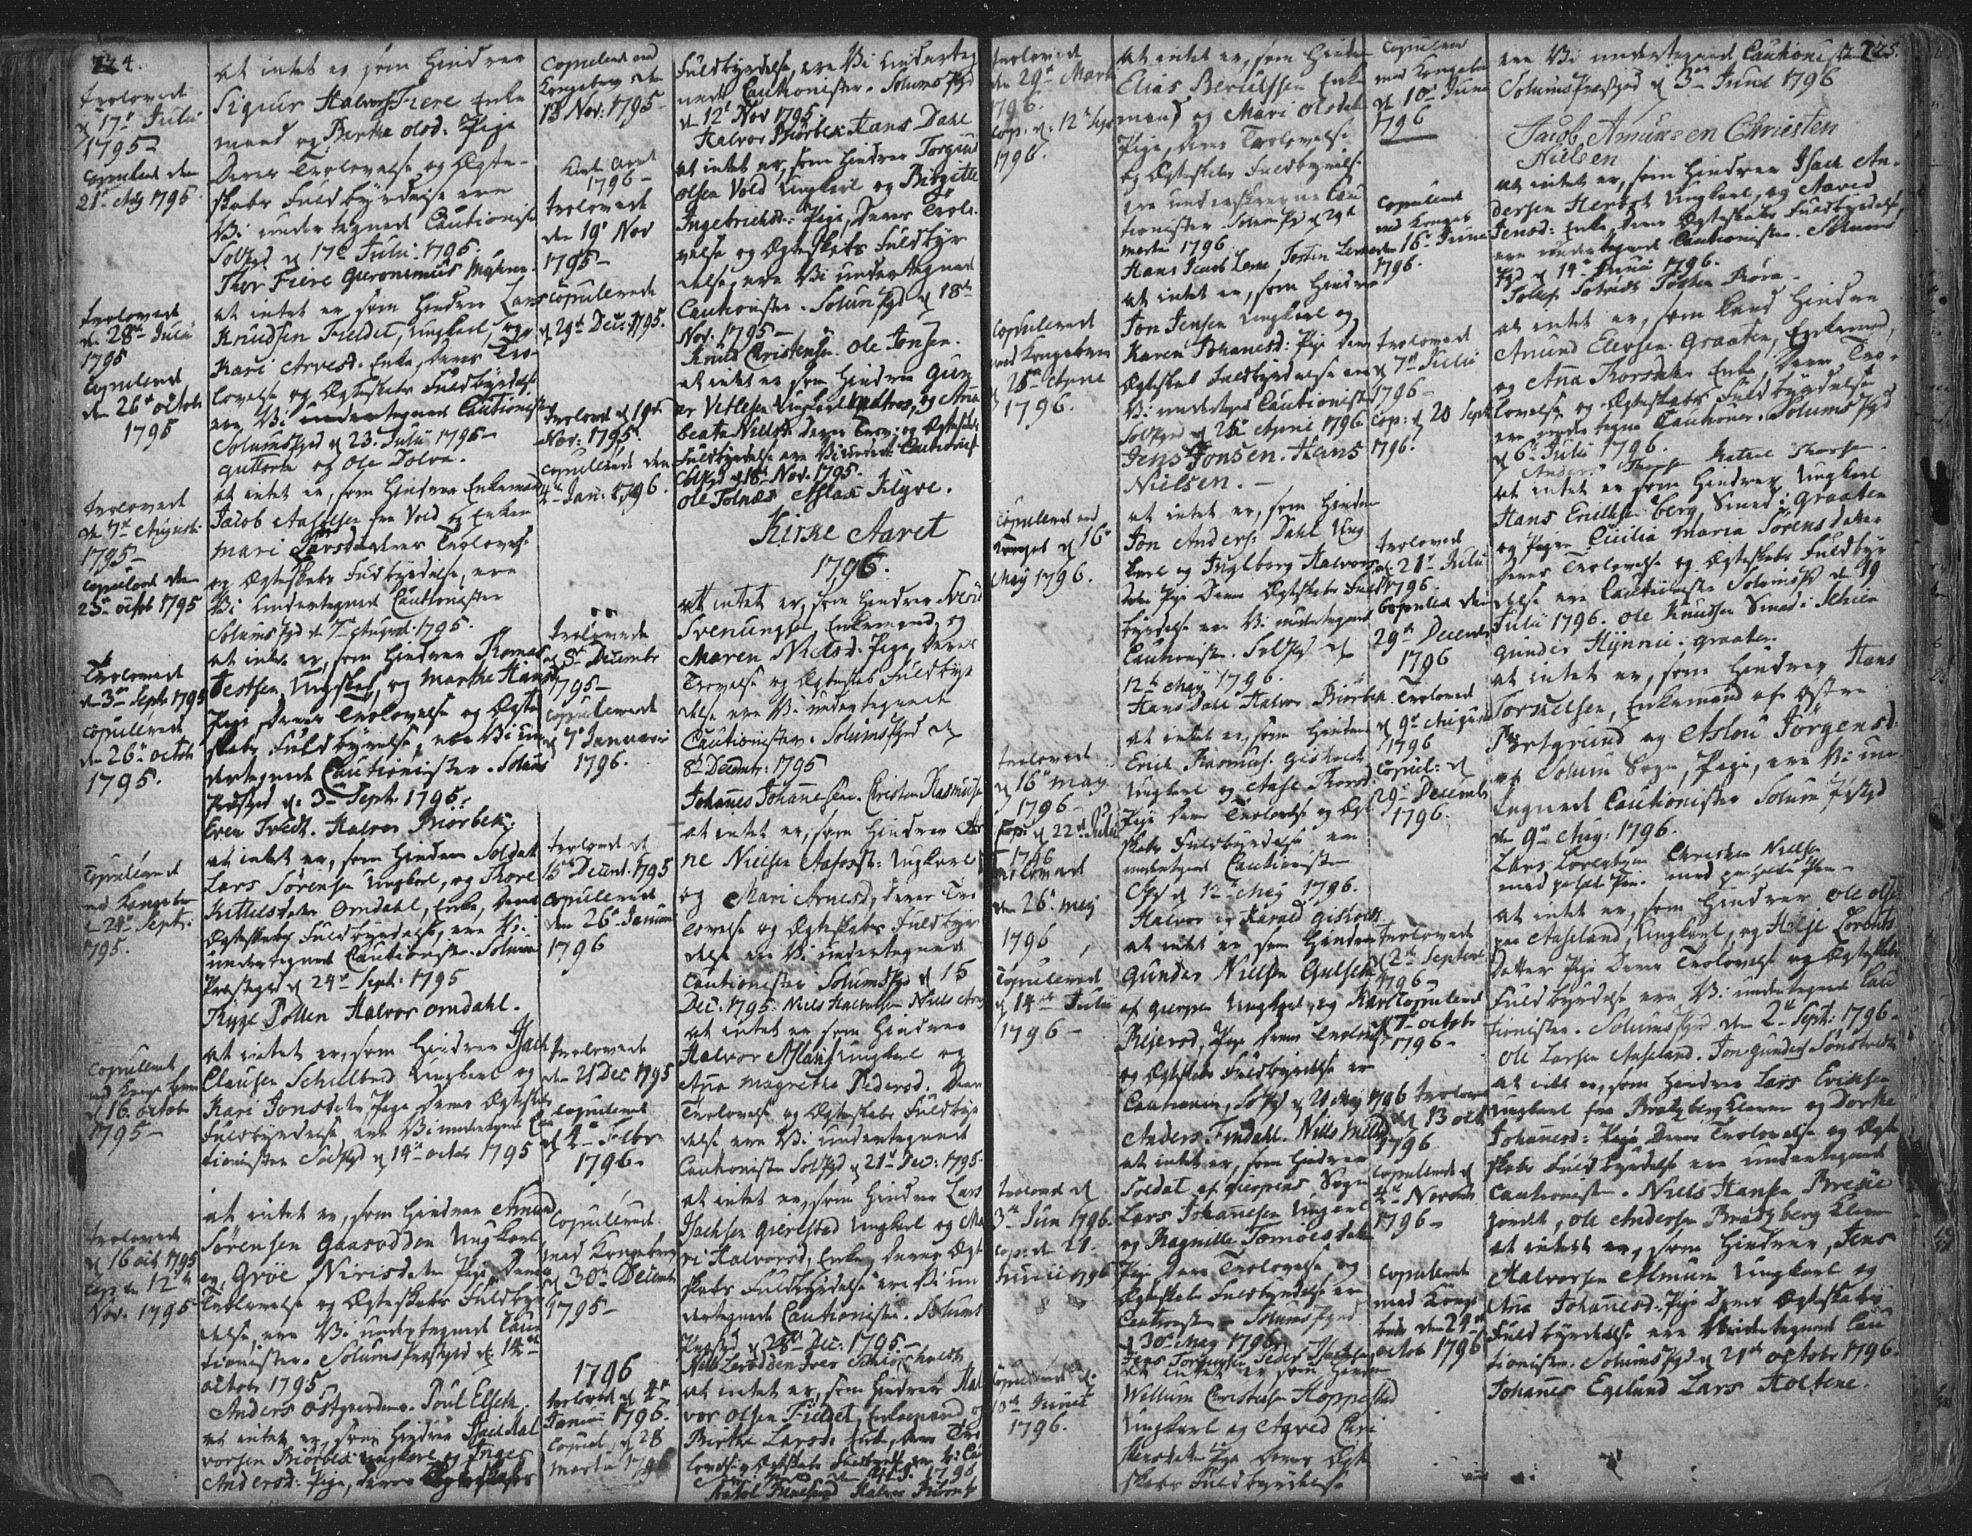 SAKO, Solum kirkebøker, F/Fa/L0003: Ministerialbok nr. I 3, 1761-1814, s. 224-225